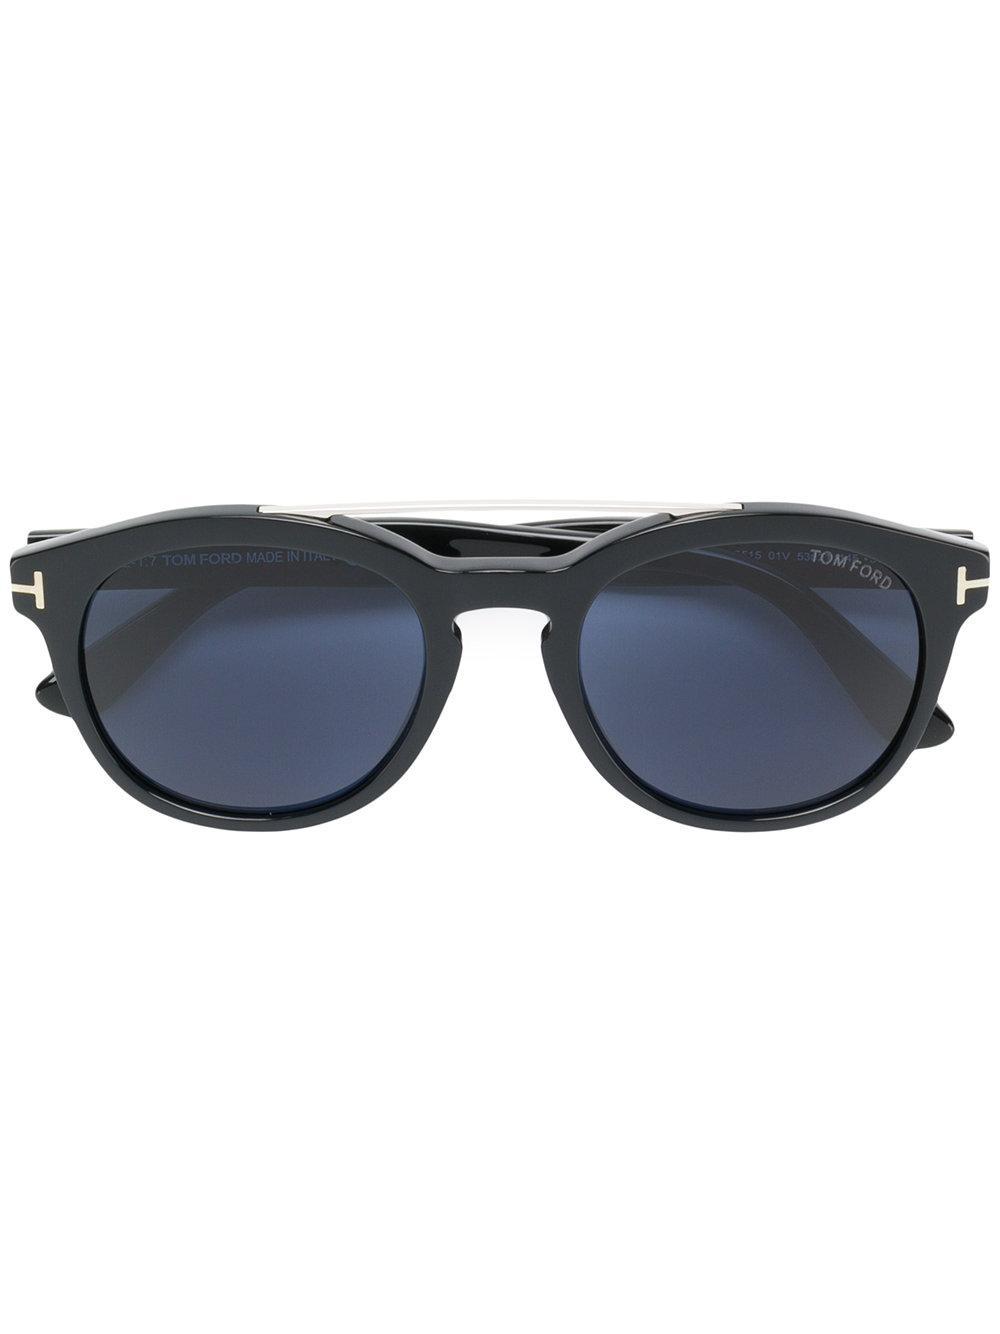 3018a4fd511f Tom Ford Newman Sunglasses | ModeSens